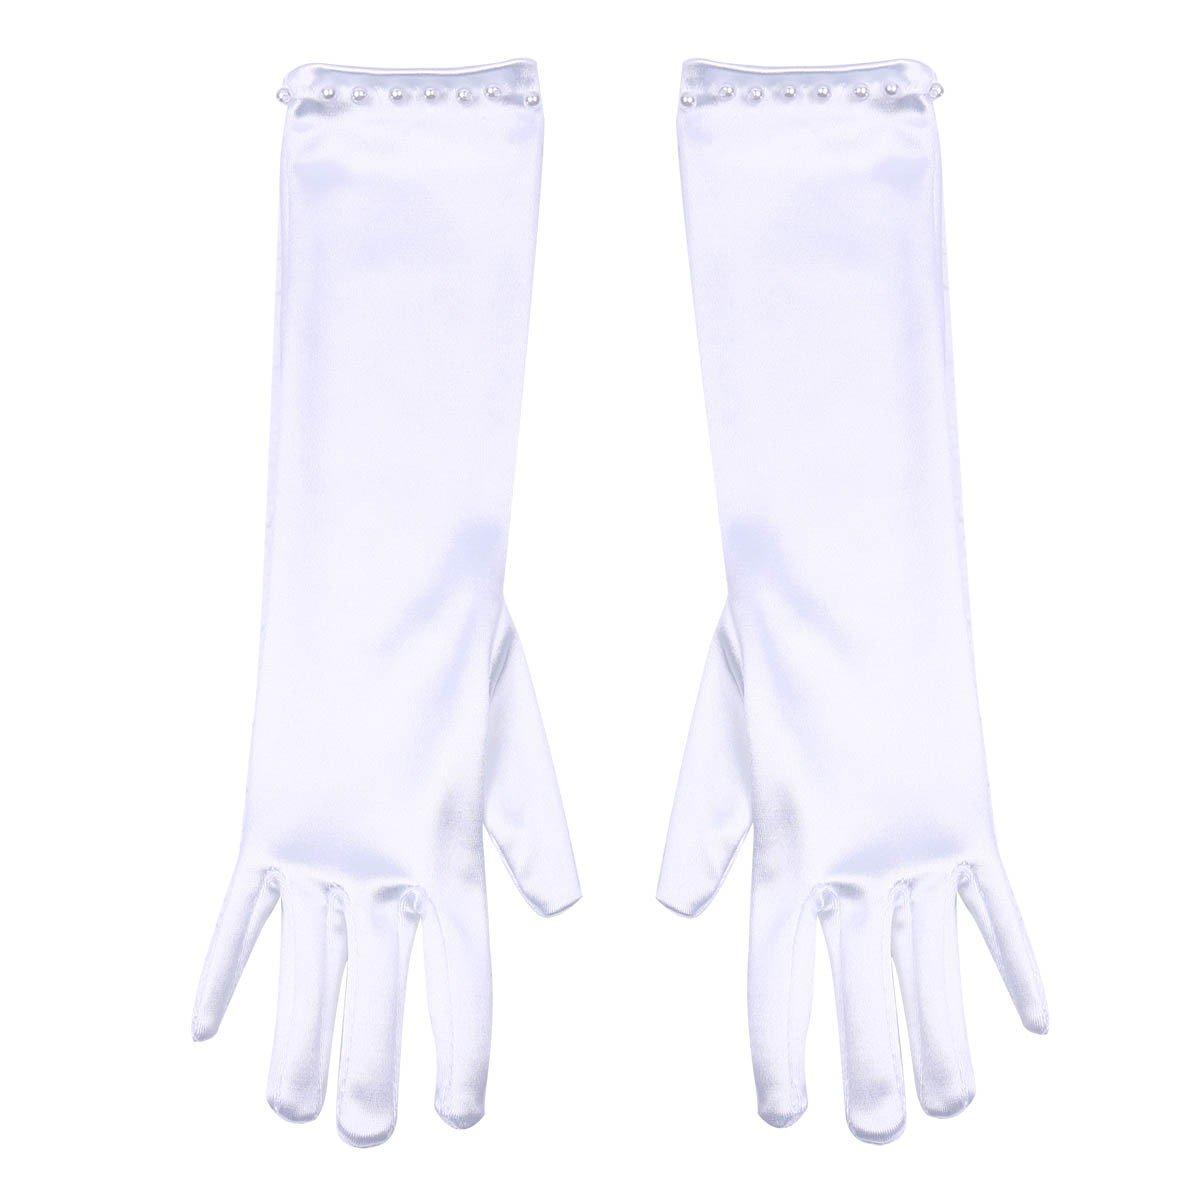 YiZYiF 1 Pair Kids Girls White Satin Formal Pageant Party Princess Dress Gloves White 3-6 Years